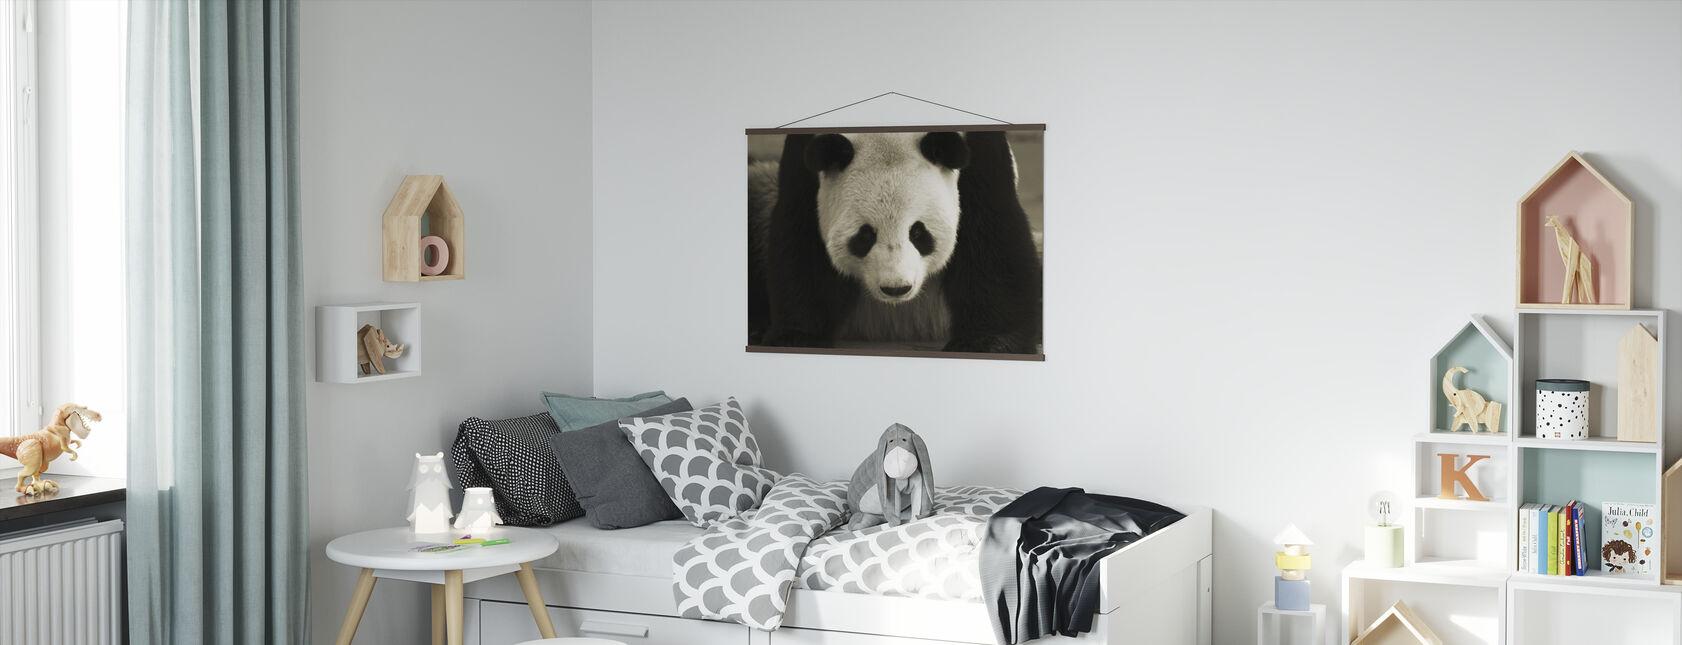 Giant Panda - Poster - Kids Room